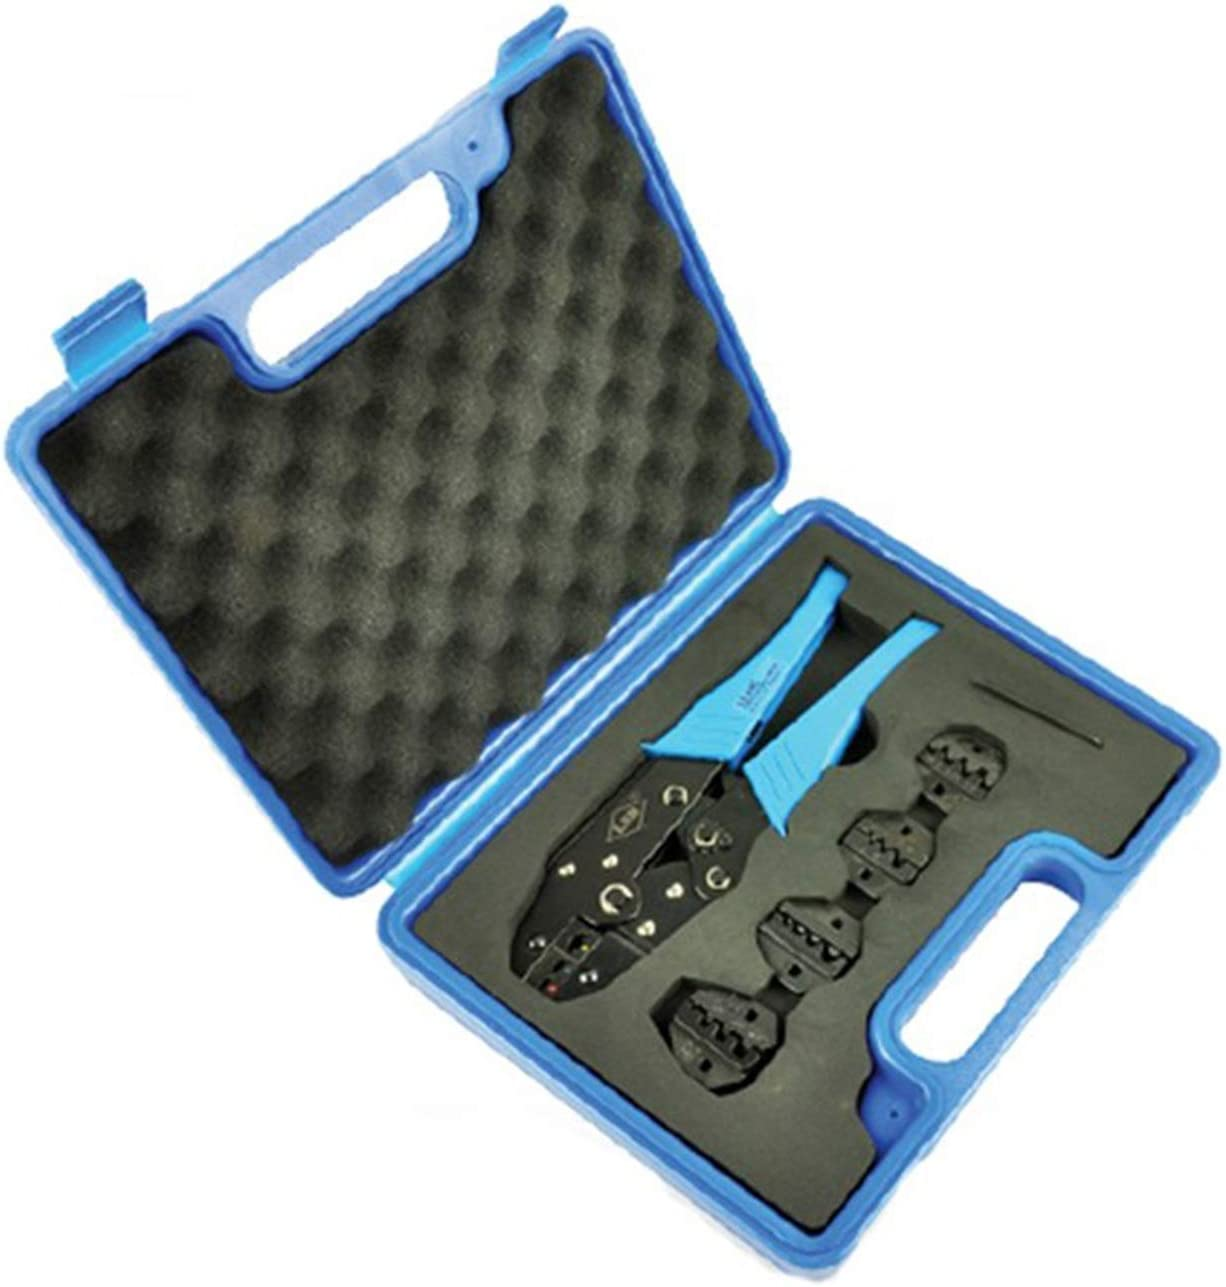 lifebea Very Topics on TV popular Crimping Tool Battery Pliers Lug